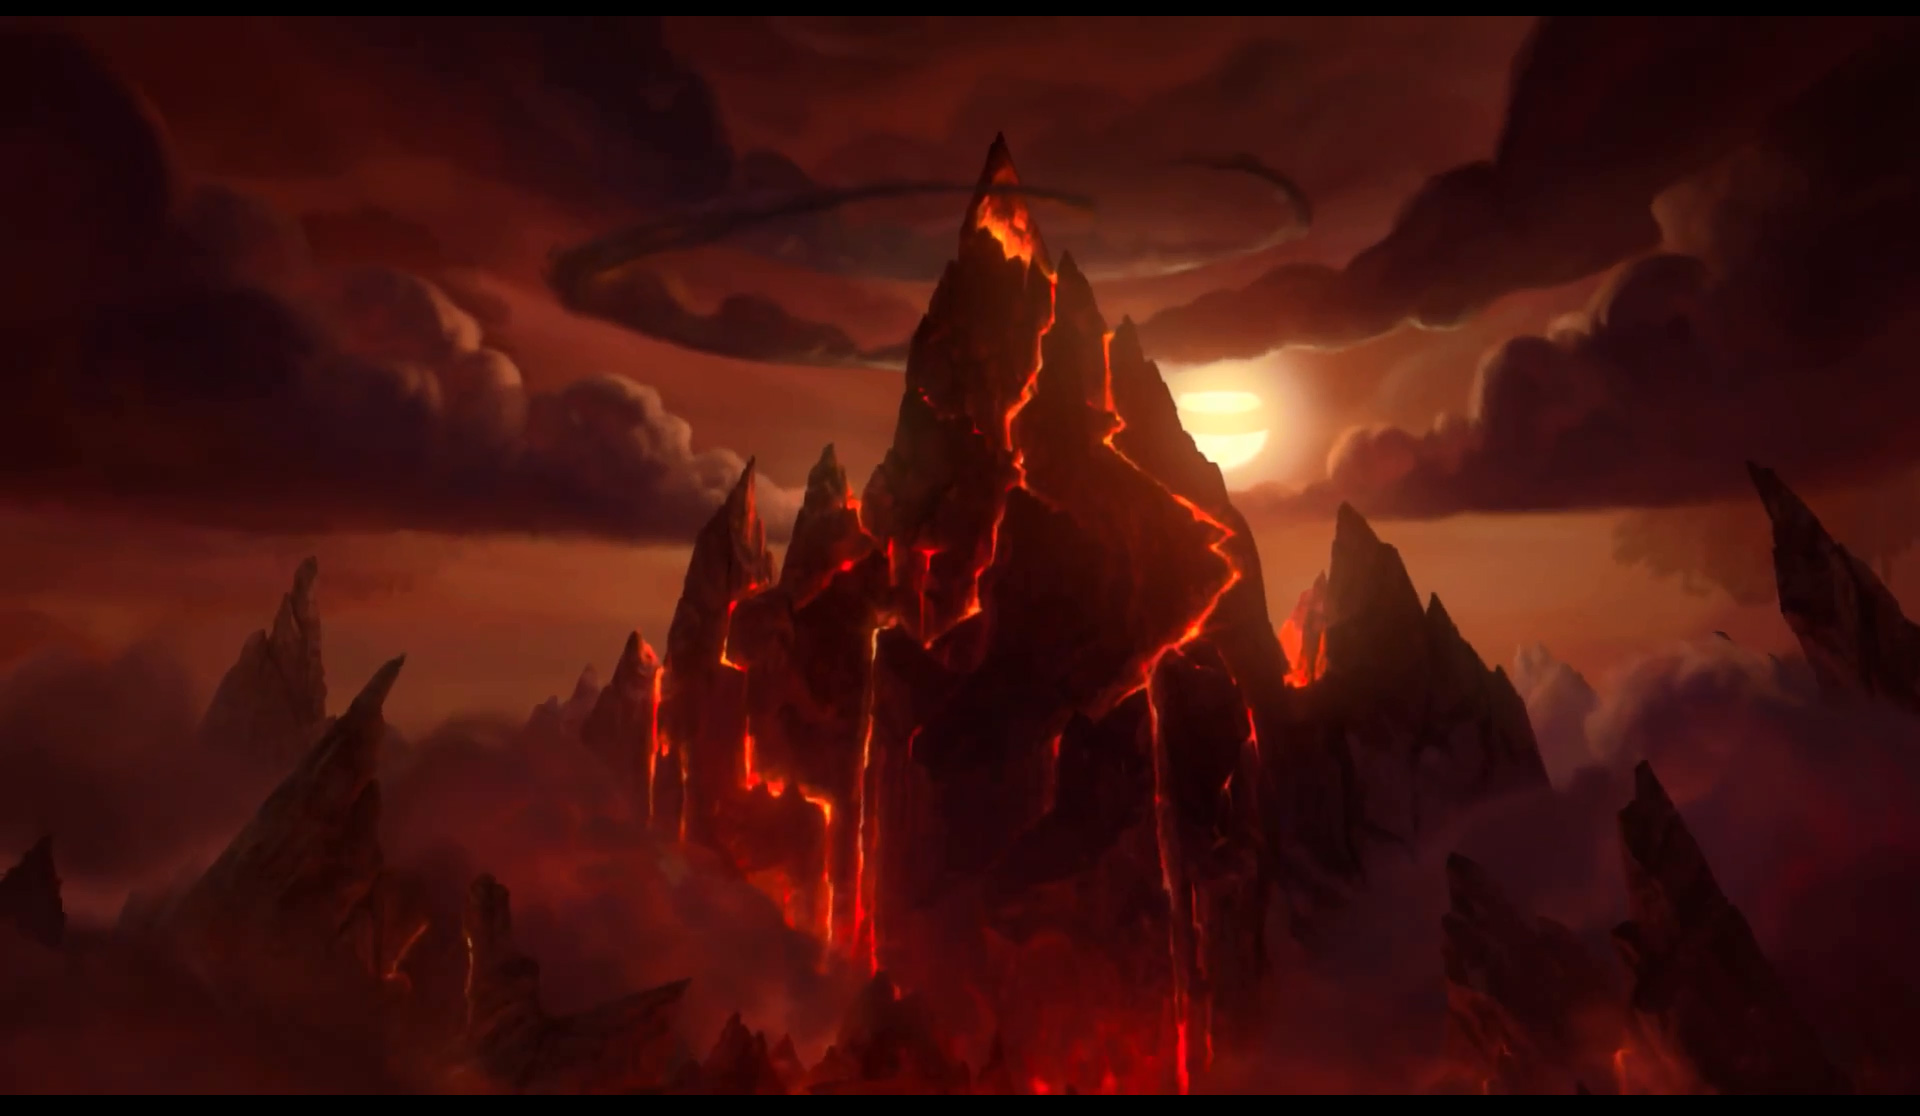 Killzone Shadow Fall Wallpapers Hd Blackrock Mountain A Hearthstone Adventure Wallpapers